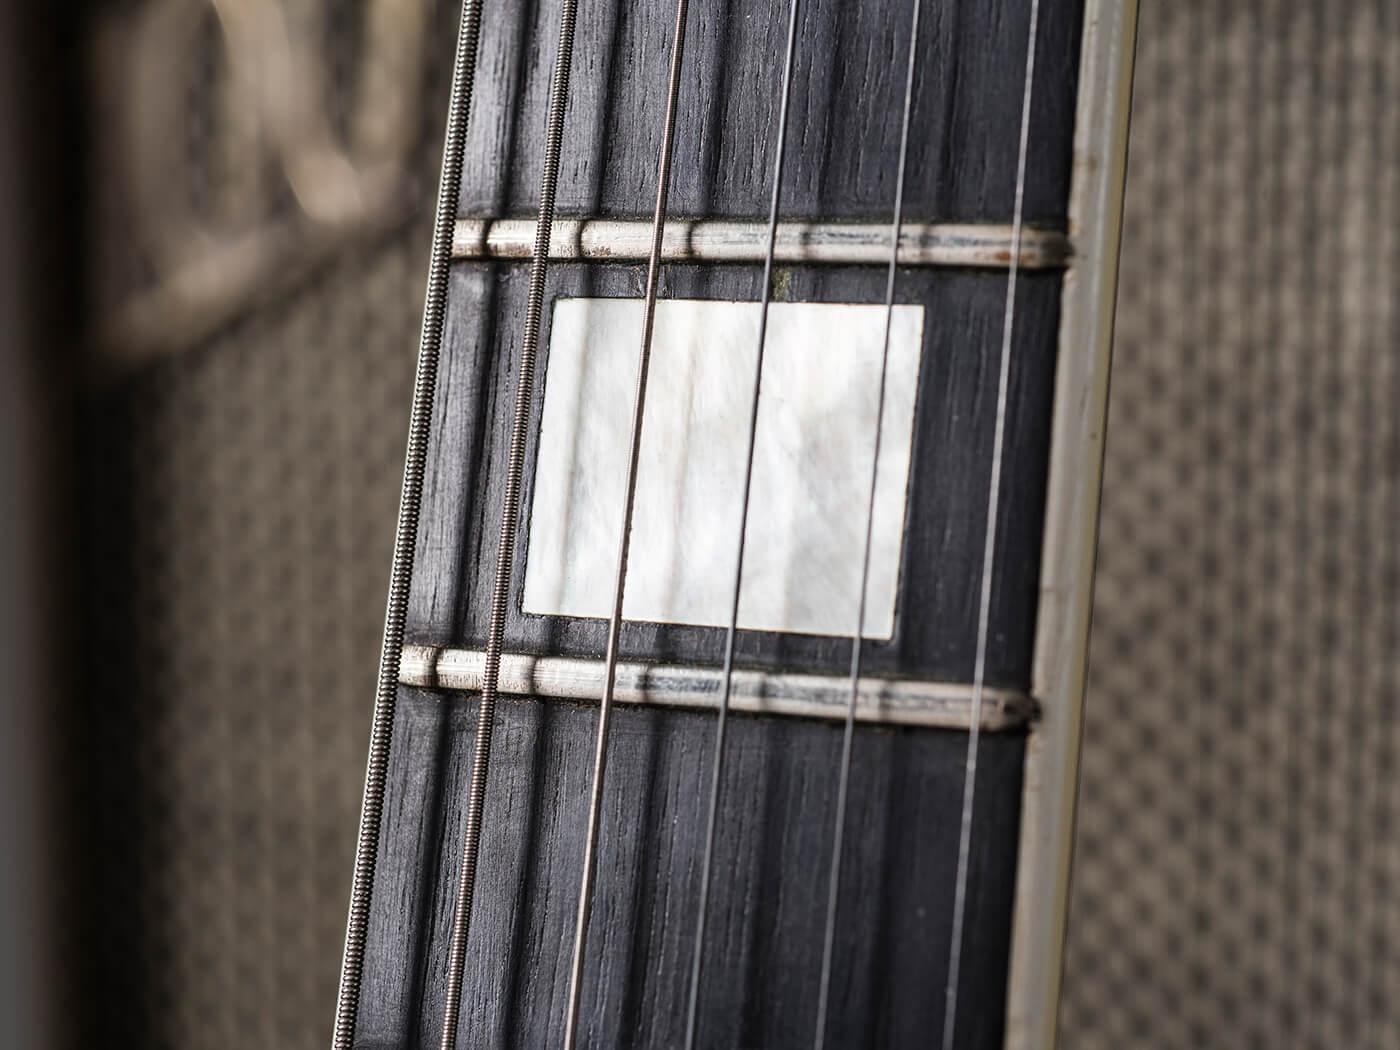 Gary Gand Red 1959 Les Paul Custom (Fretboard)